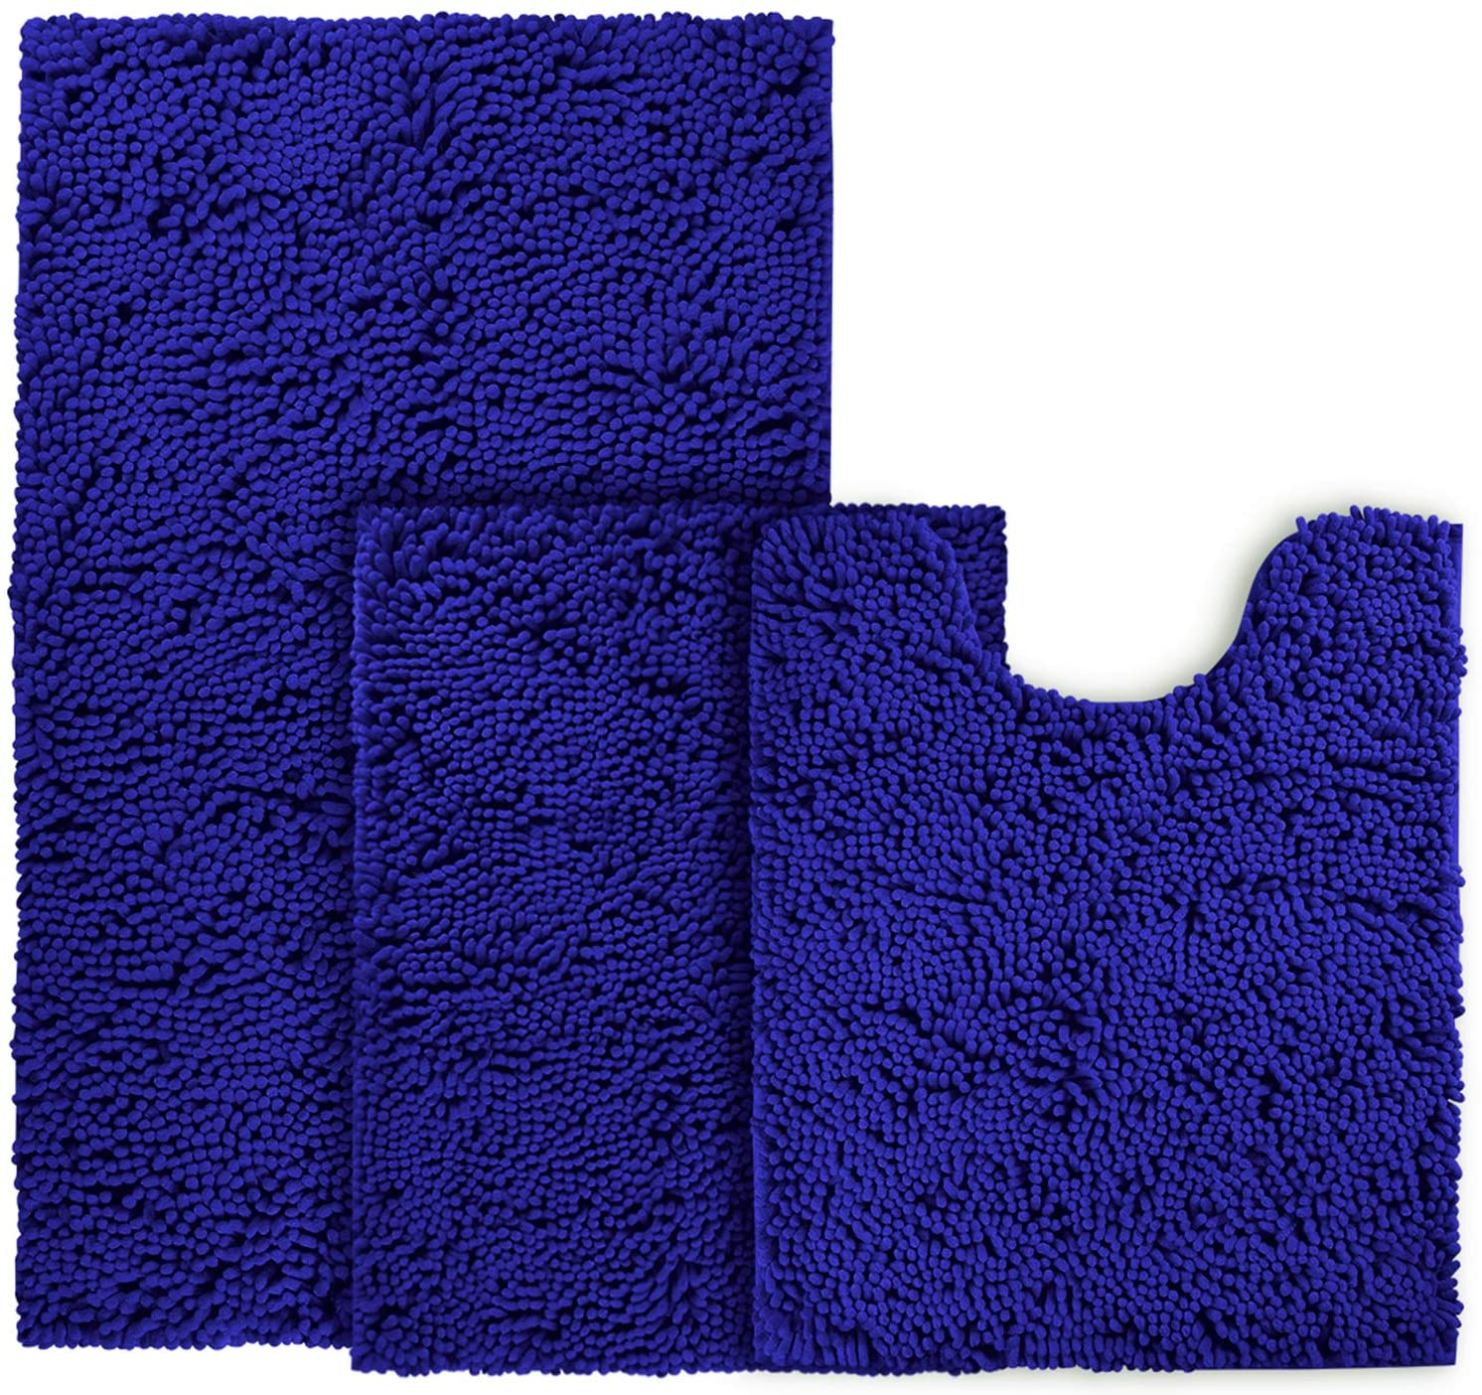 Amazon Com Bysure Royal Blue Bathroom Rug Set 3 Piece Non Slip Extra Absorbent Shaggy Chenille Bathroom Rugs And Mats Sets Soft Dry Bath Rug Mat Sets For Bathroom Washable Carpets Set Kitchen